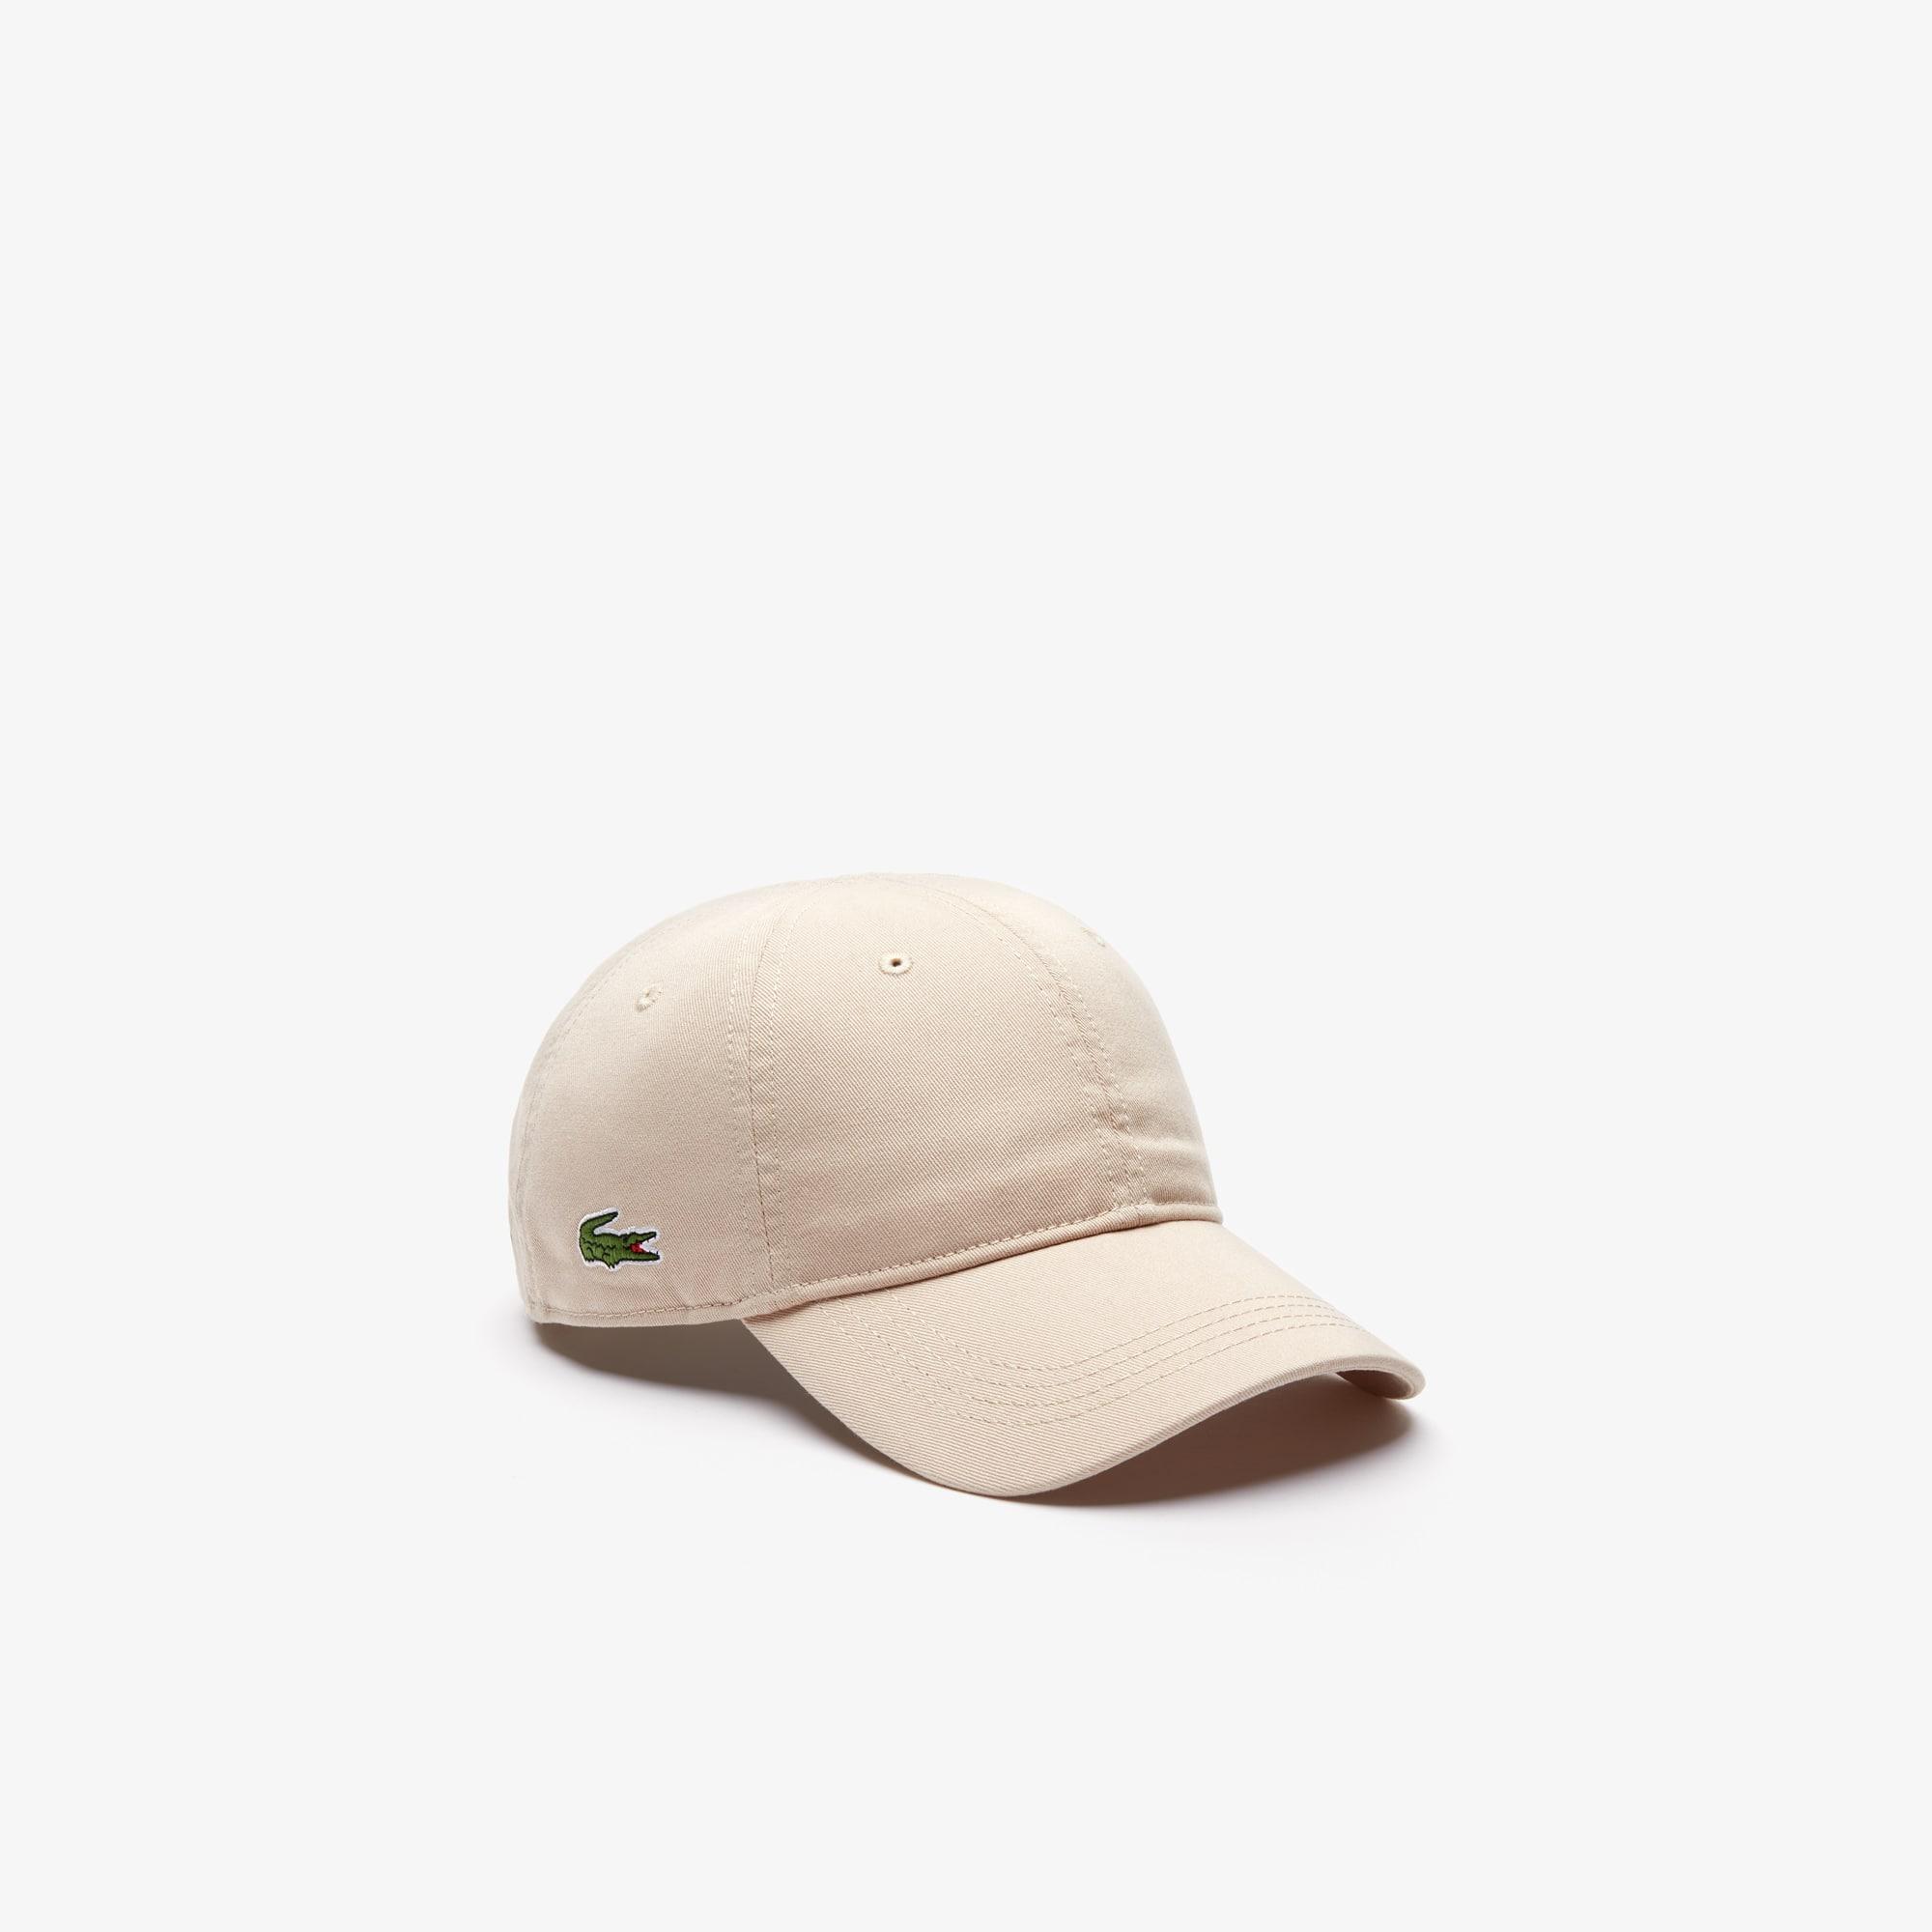 02da8e52485 Caps   Hats